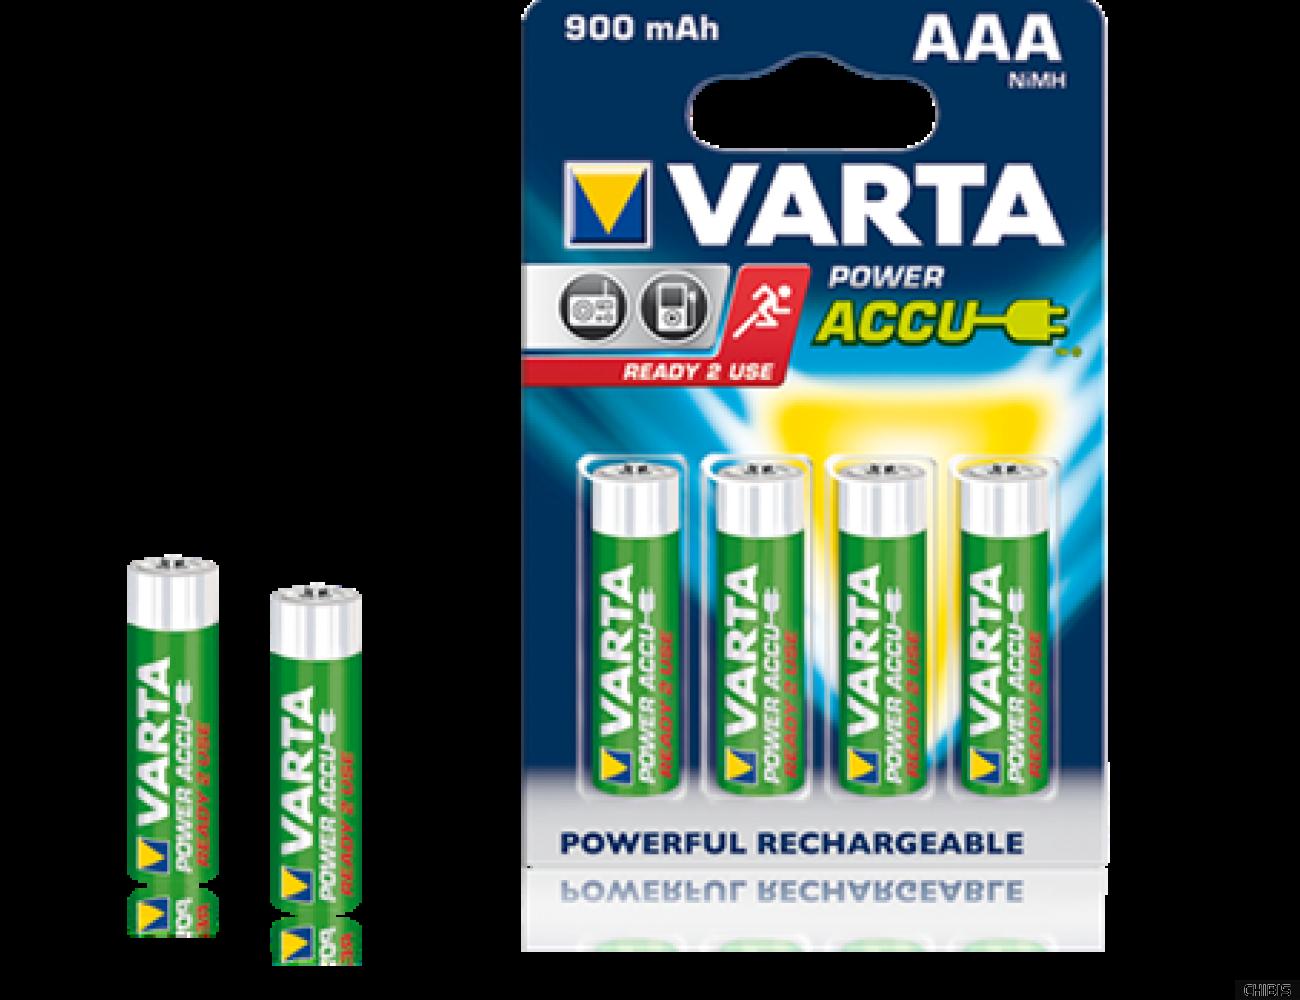 Аккумуляторные батарейки ААА Varta 900 mAh Power HR03, 900 mAh, 1.2V, Ni-Mh  56713101404